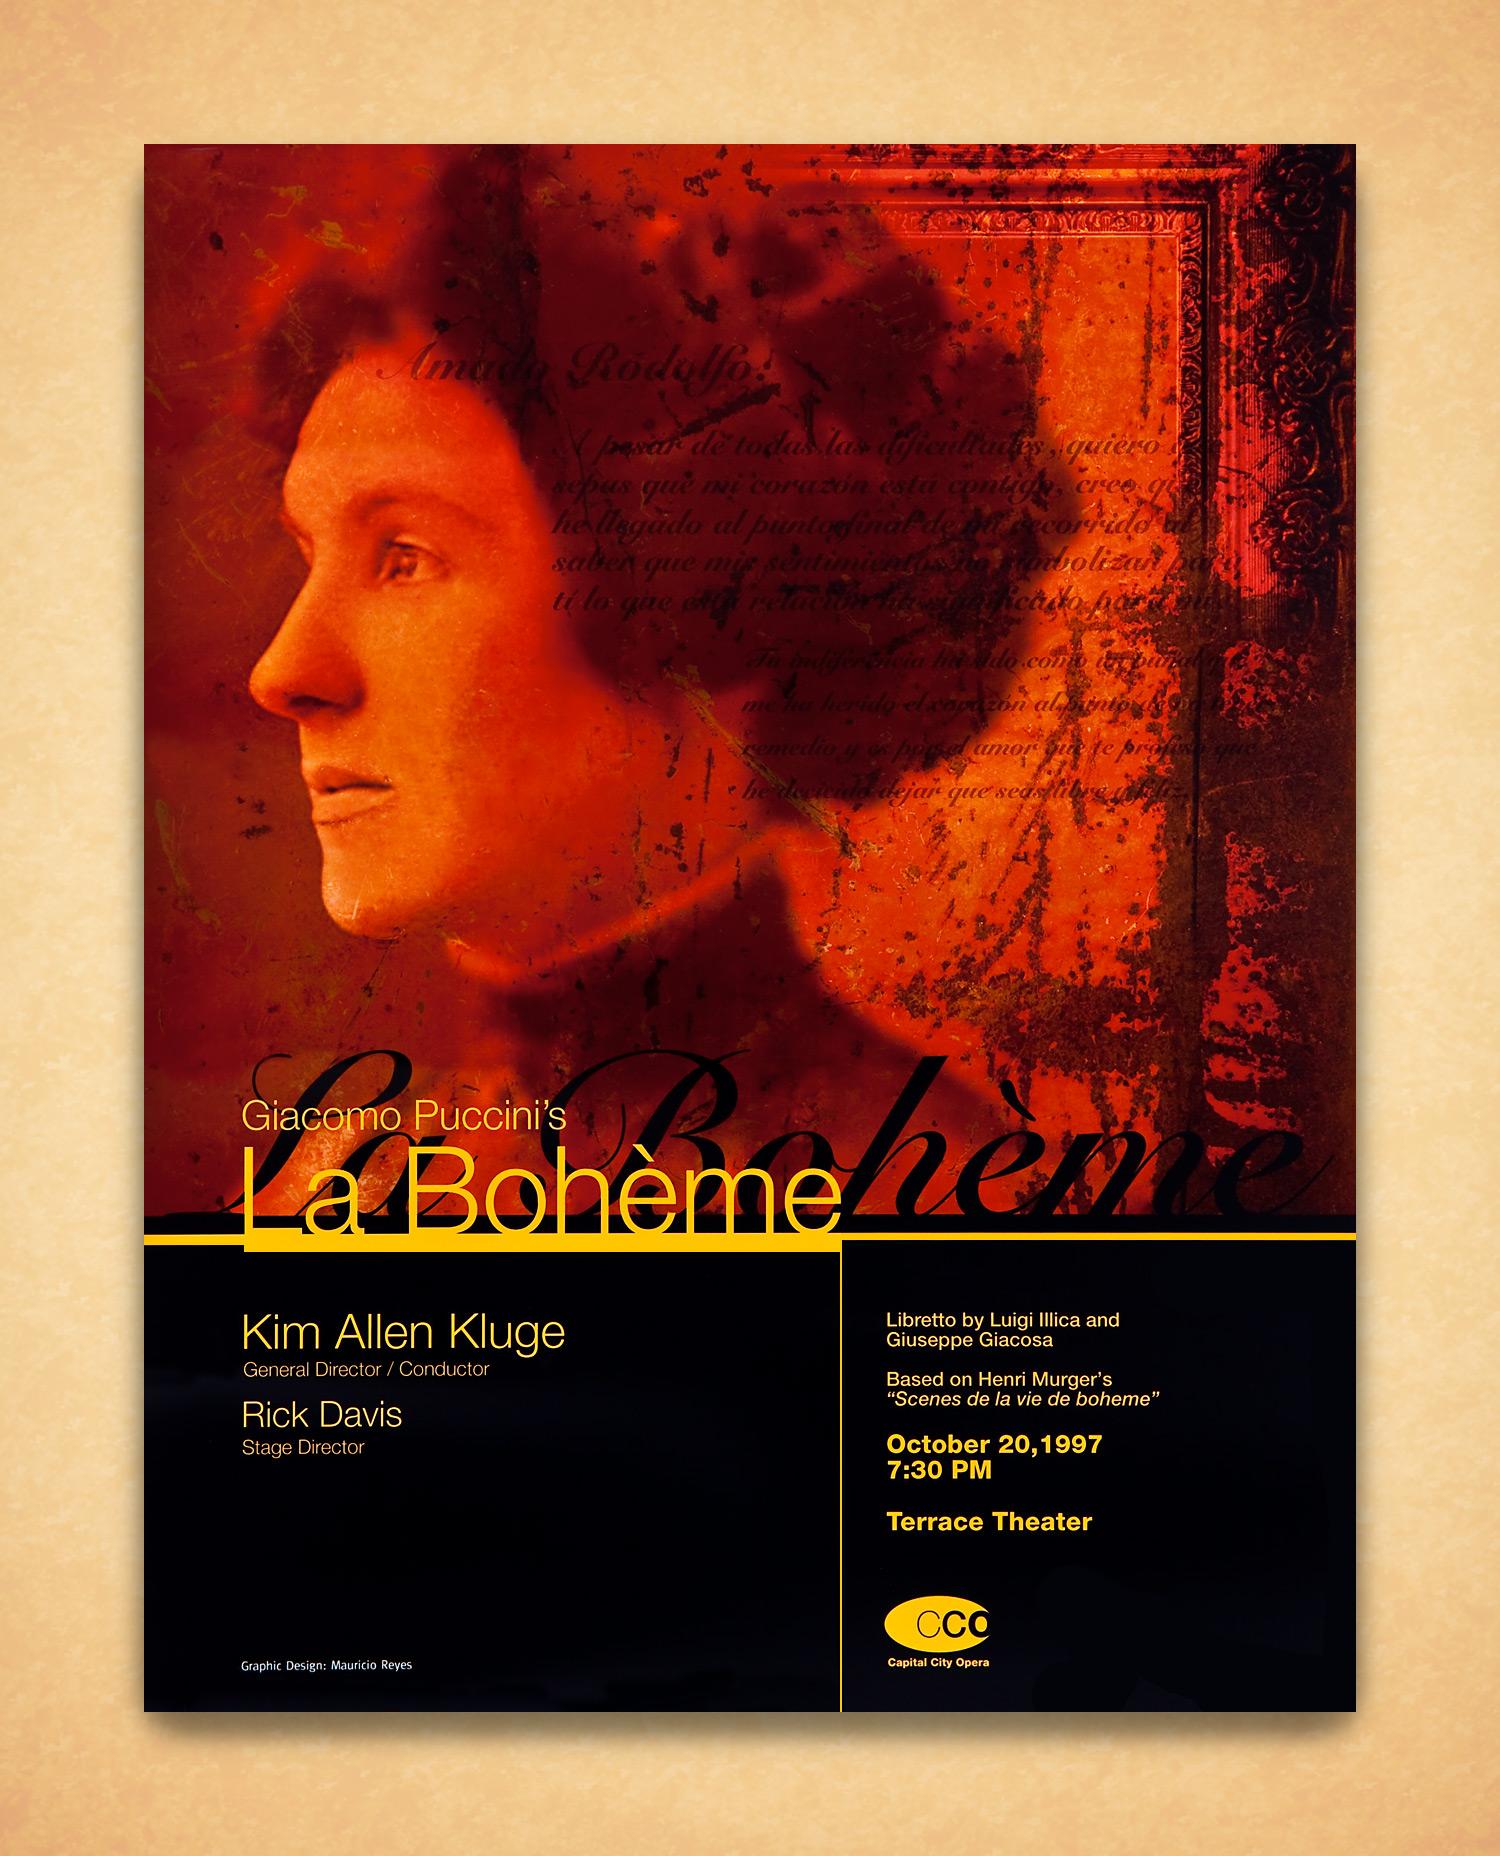 Kennedy Center Concert Poster